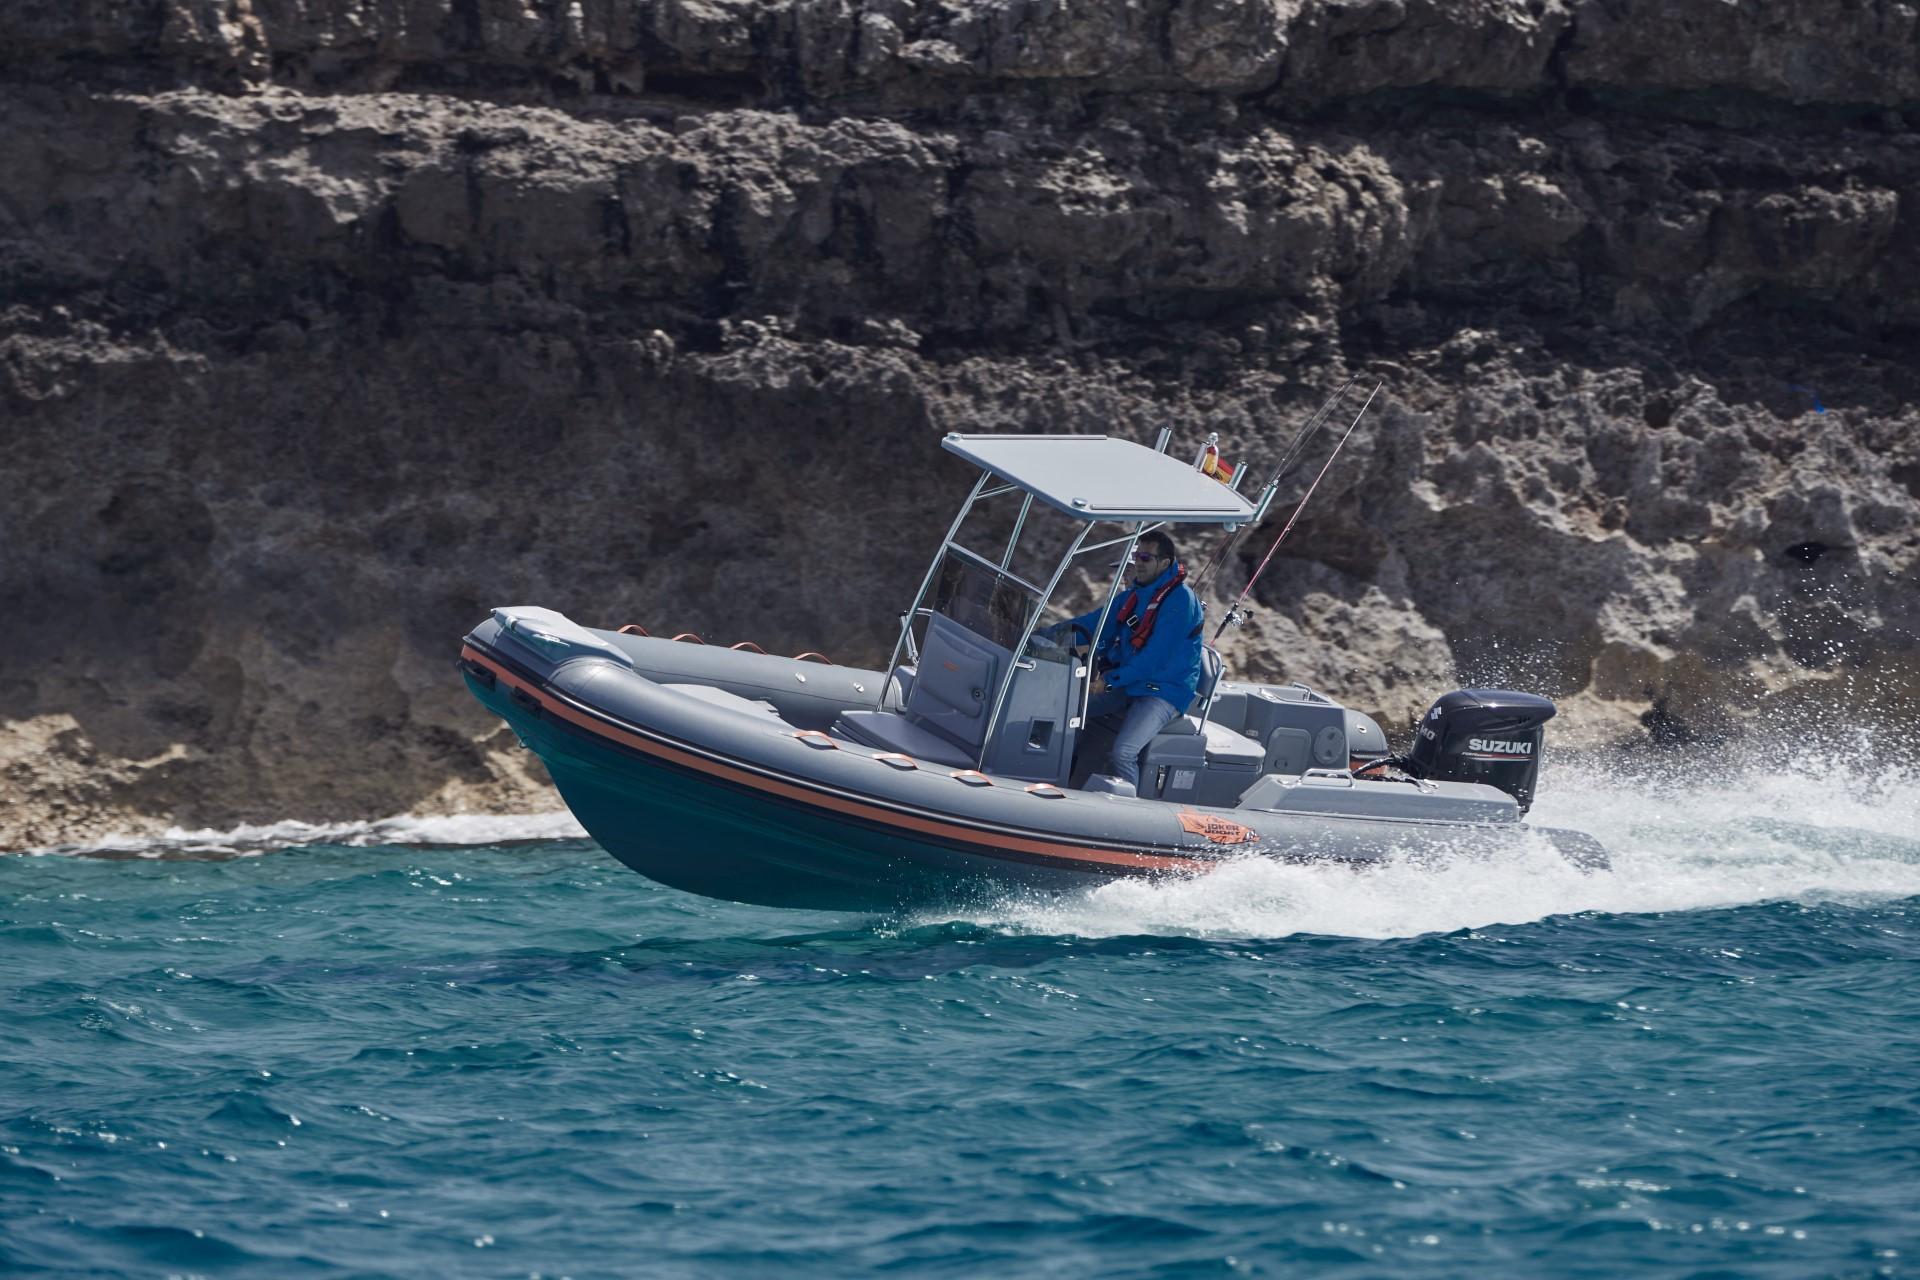 Joker Boat Barracuda gliding